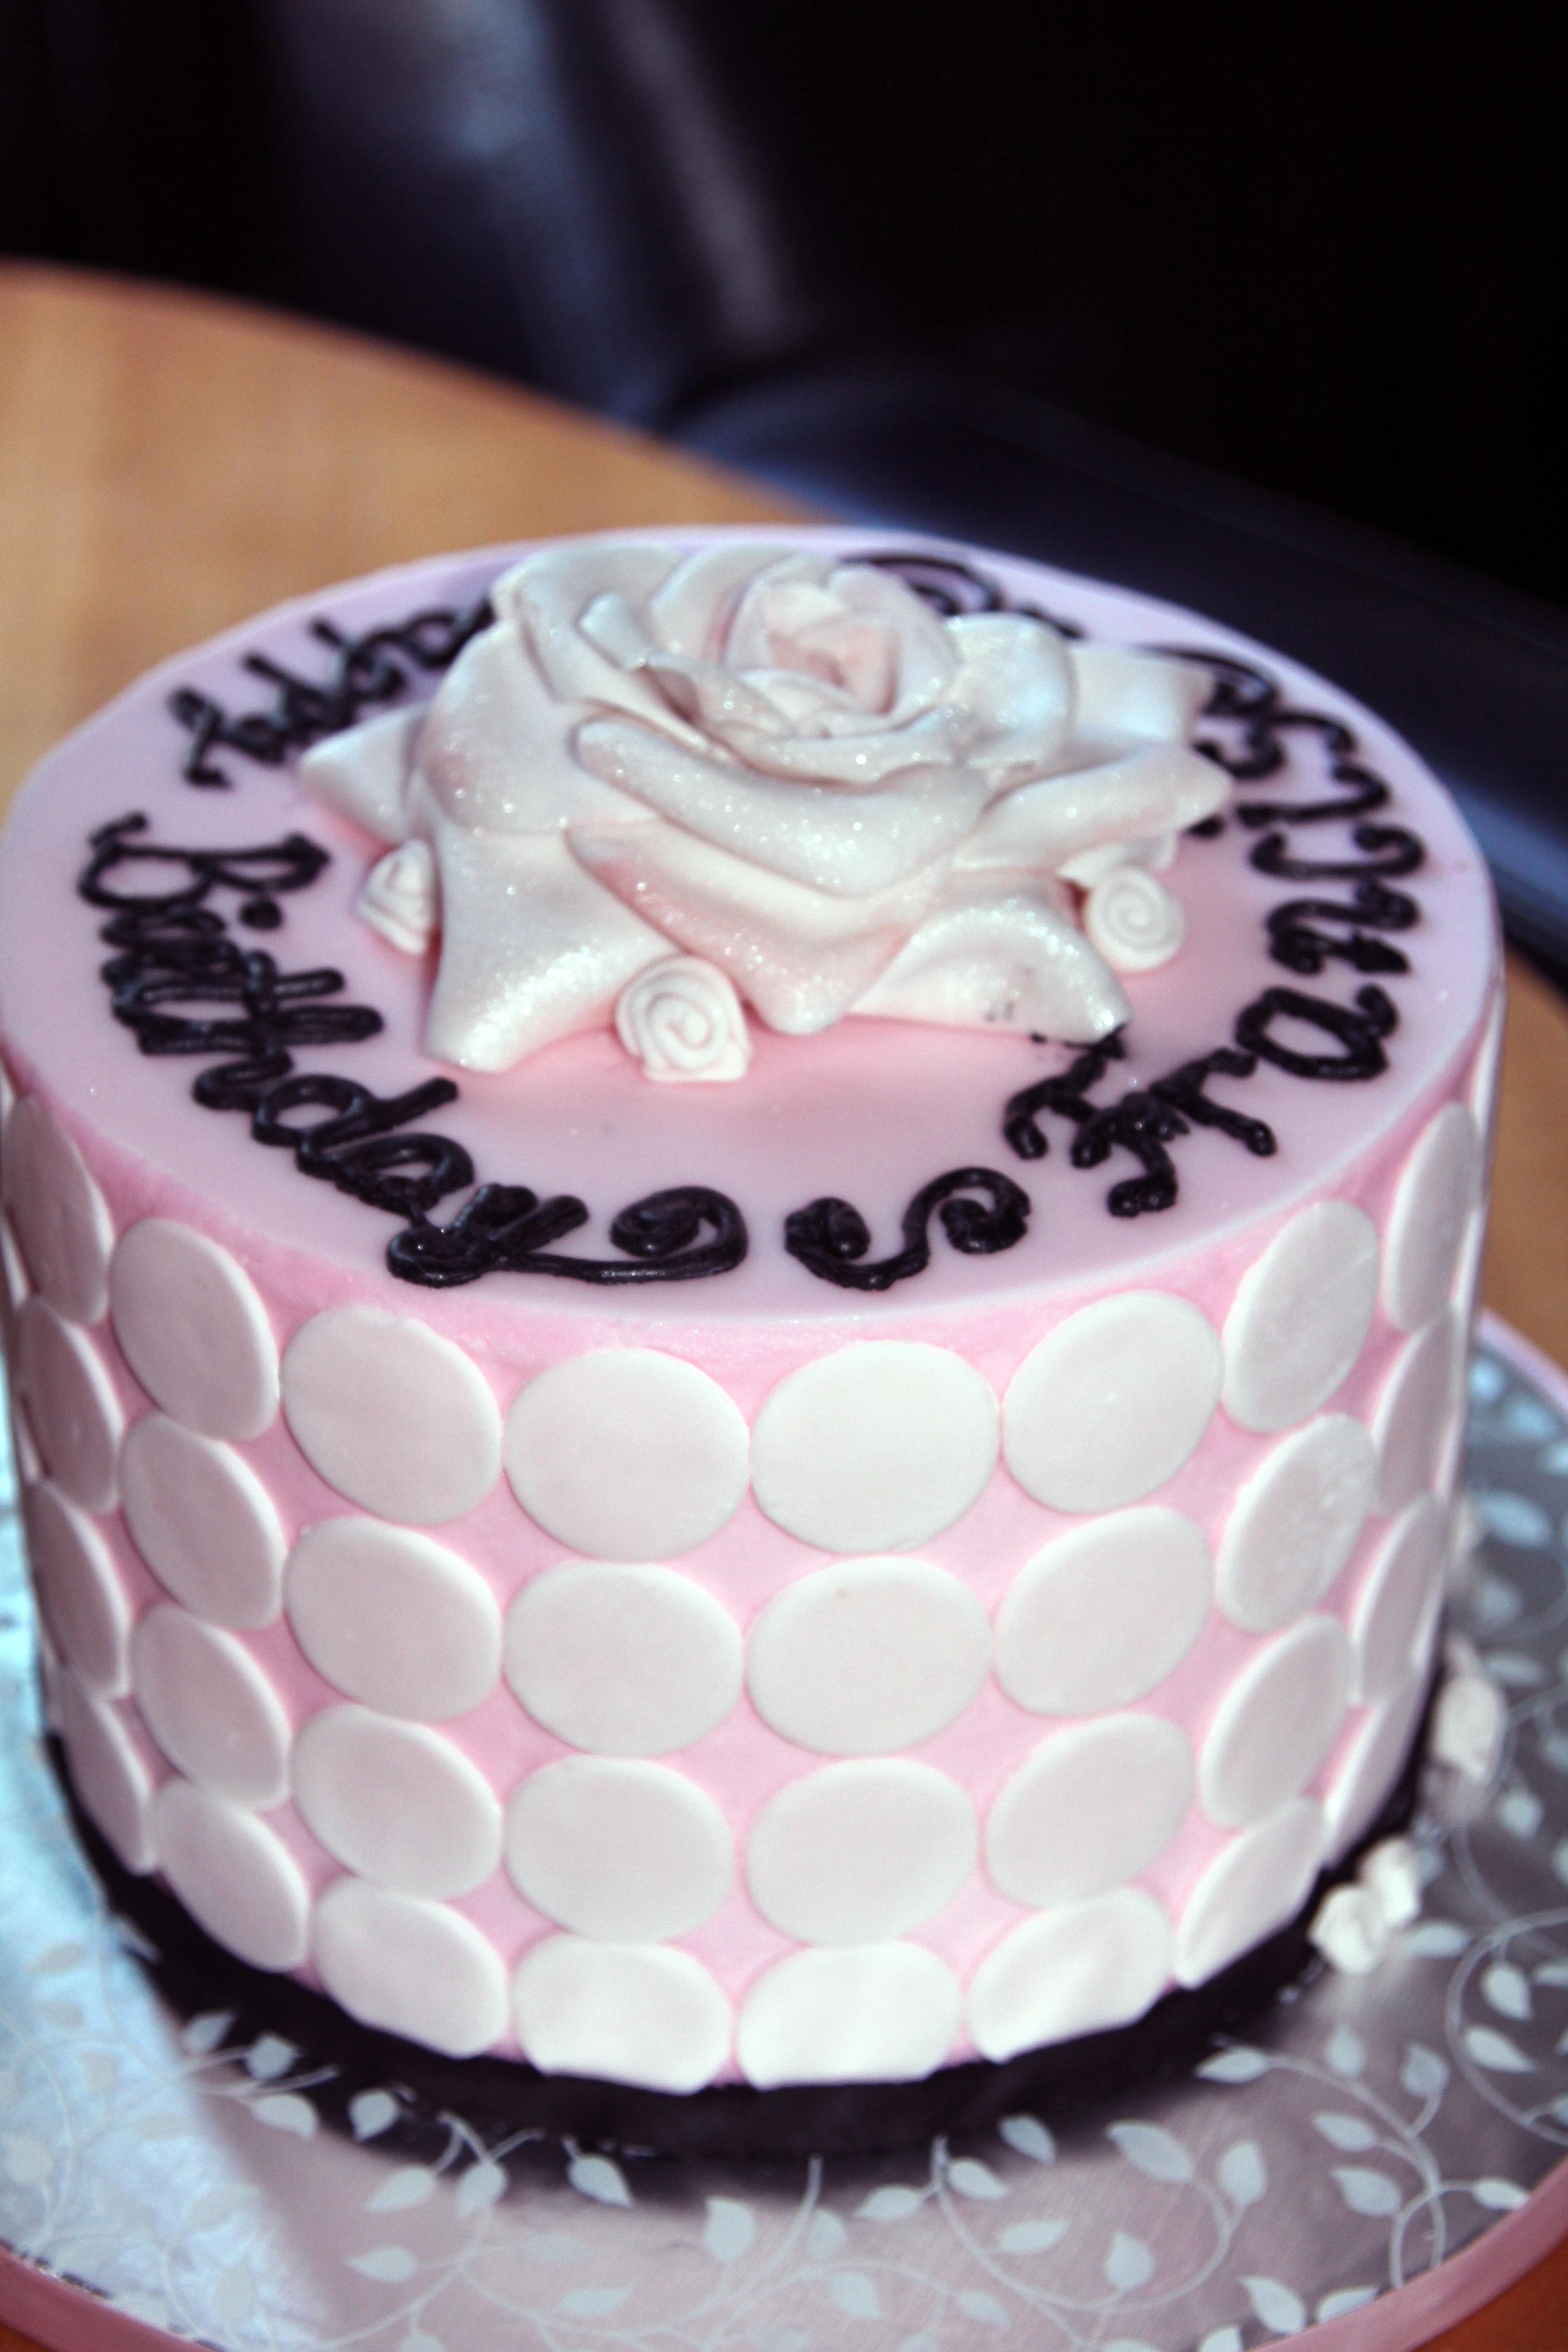 dulce celebracion comida rosado chocolate magdalena postre boda pastel pastel de cumpleaos azcar formacin de hielo